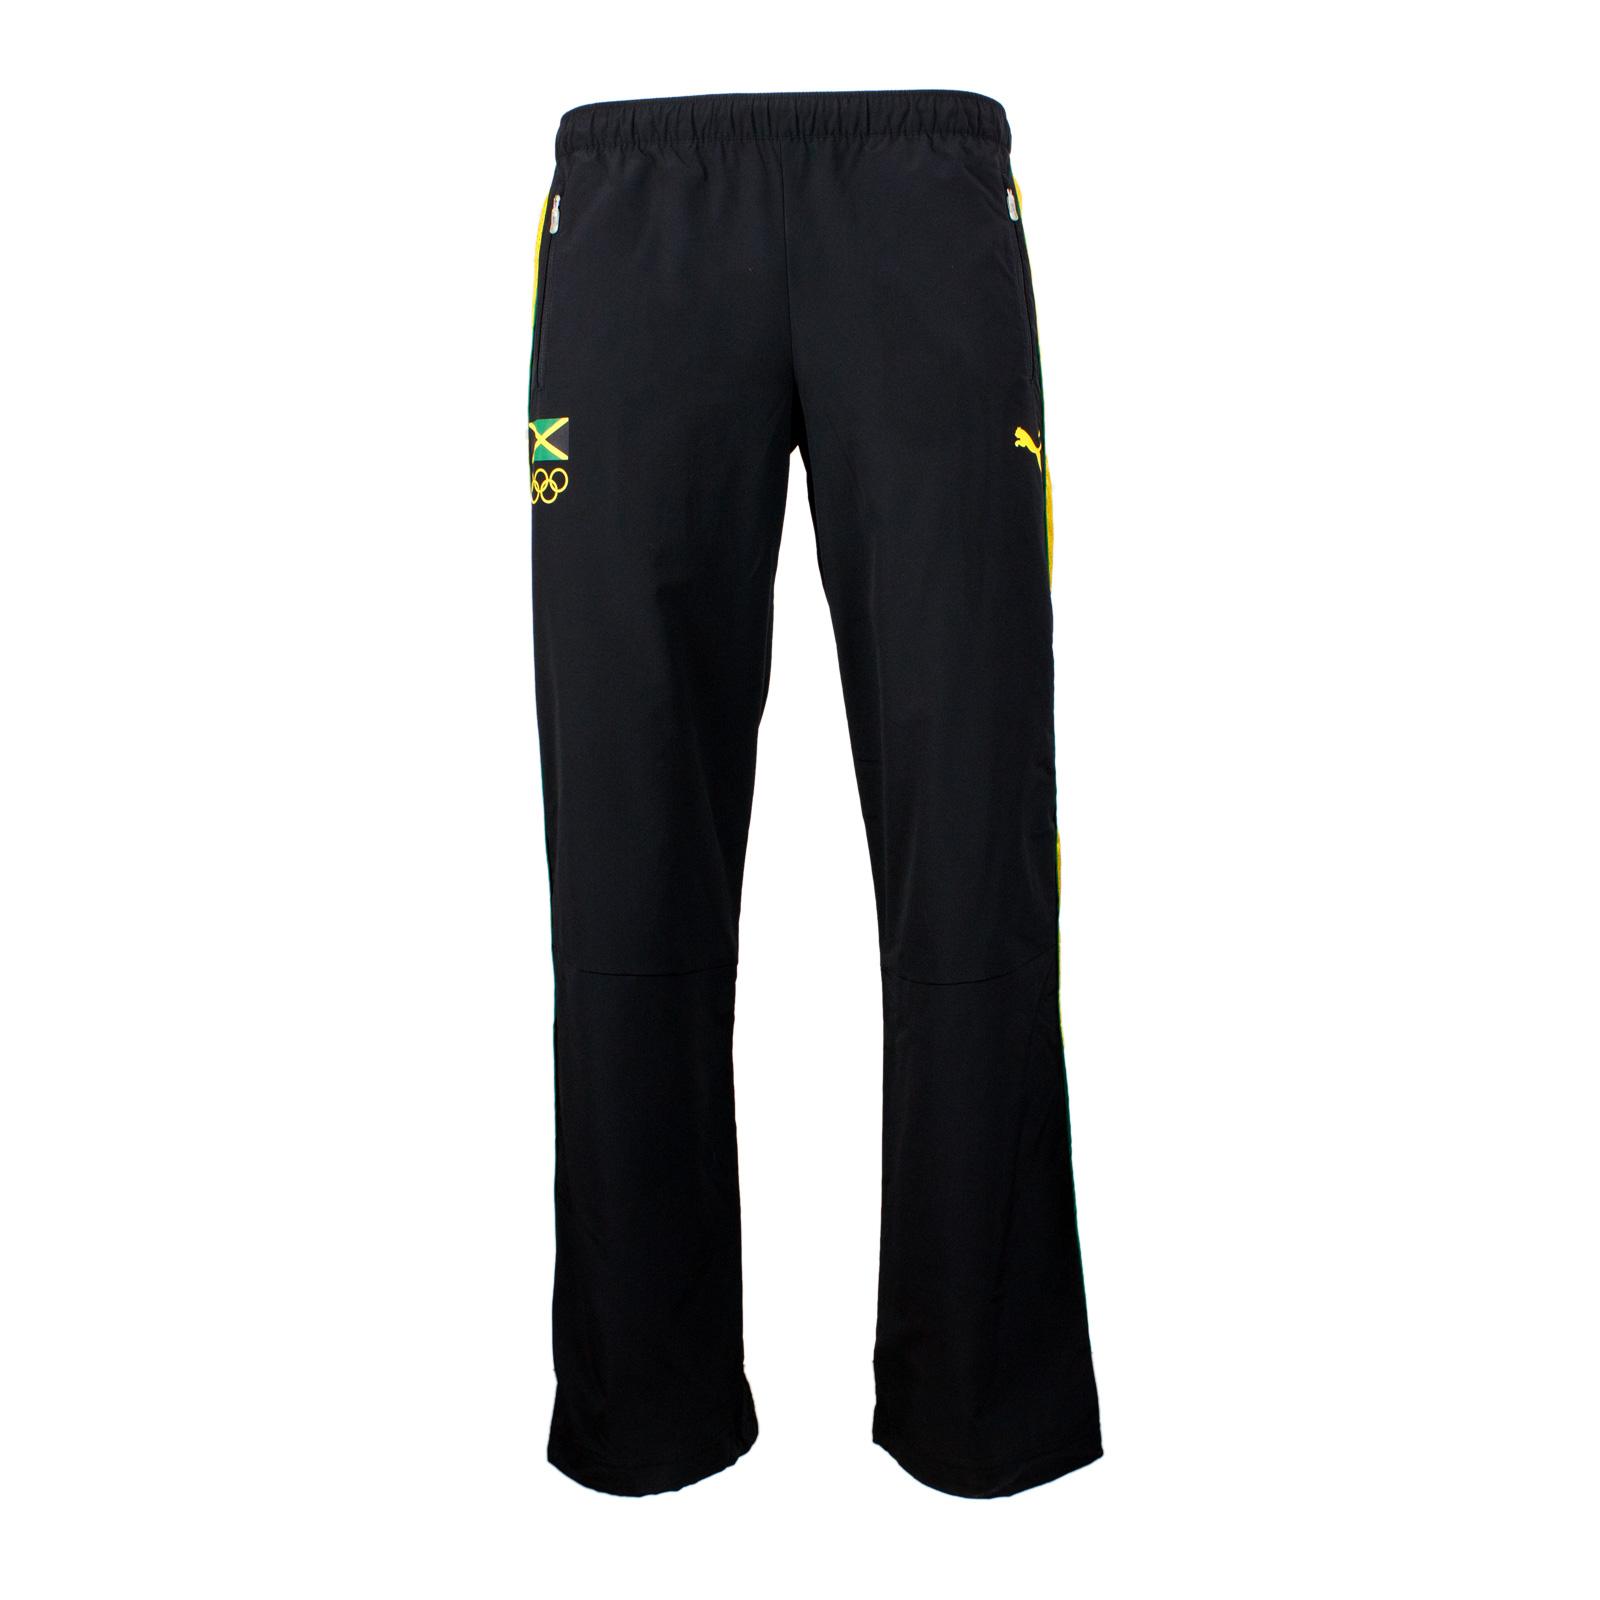 Puma Jamaica Damen Warm Up Pants Jogginghose Trainingshose schwarz 36 38 40 42